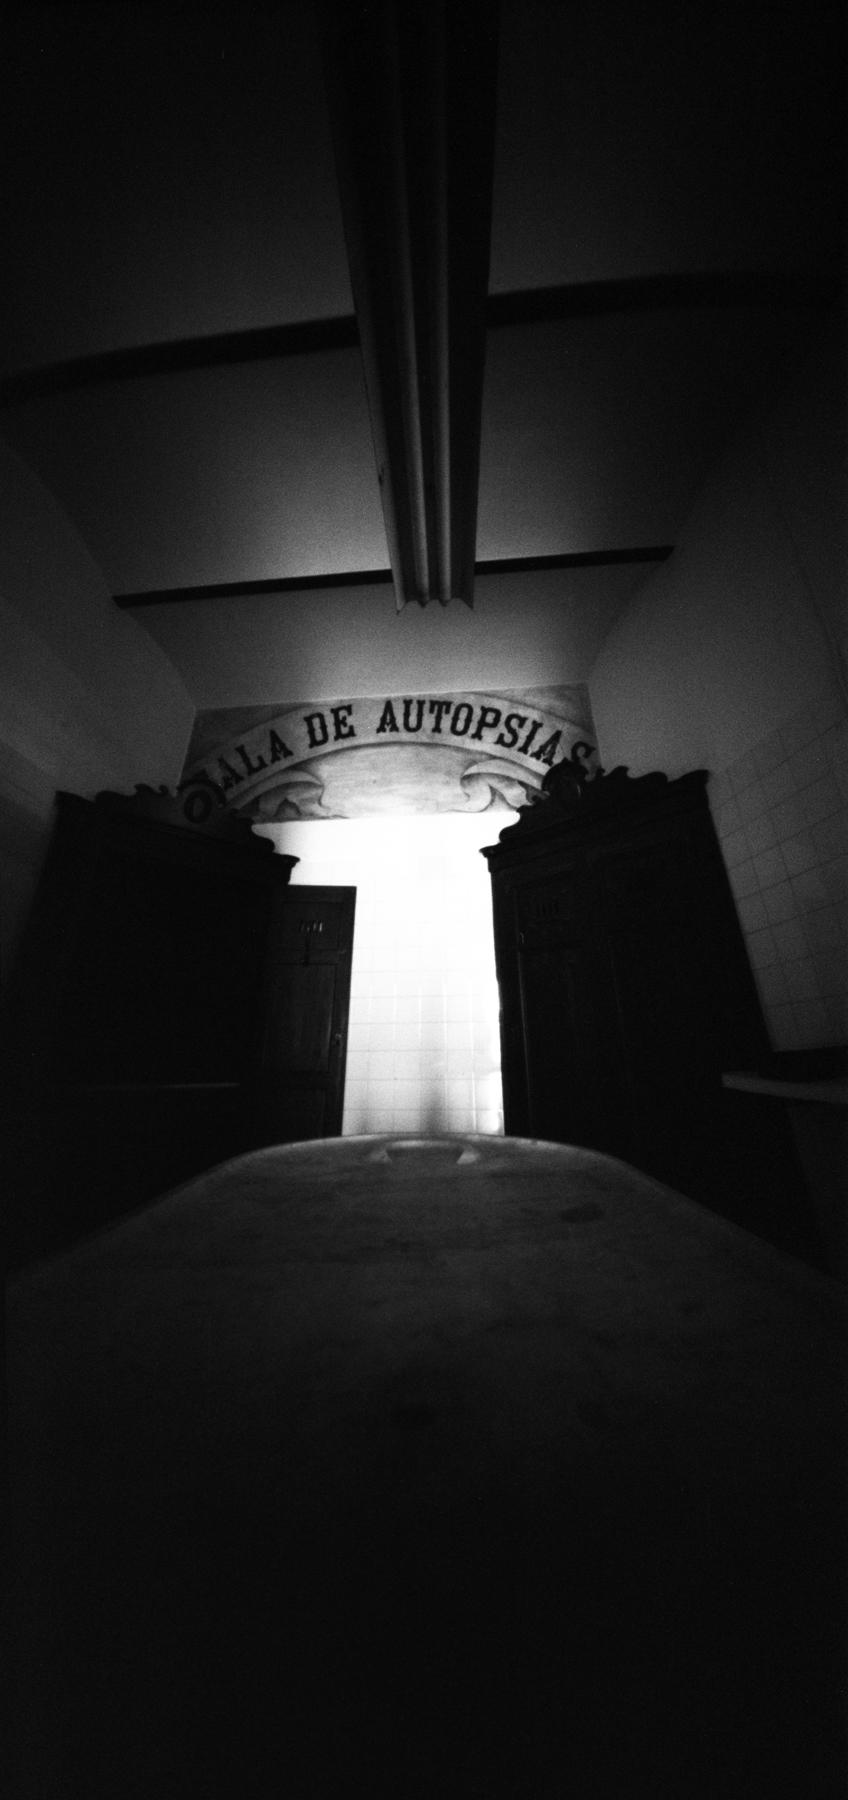 Jesús Joglar | Autopsy Room | 6x12 pinhole | Ilford HP5